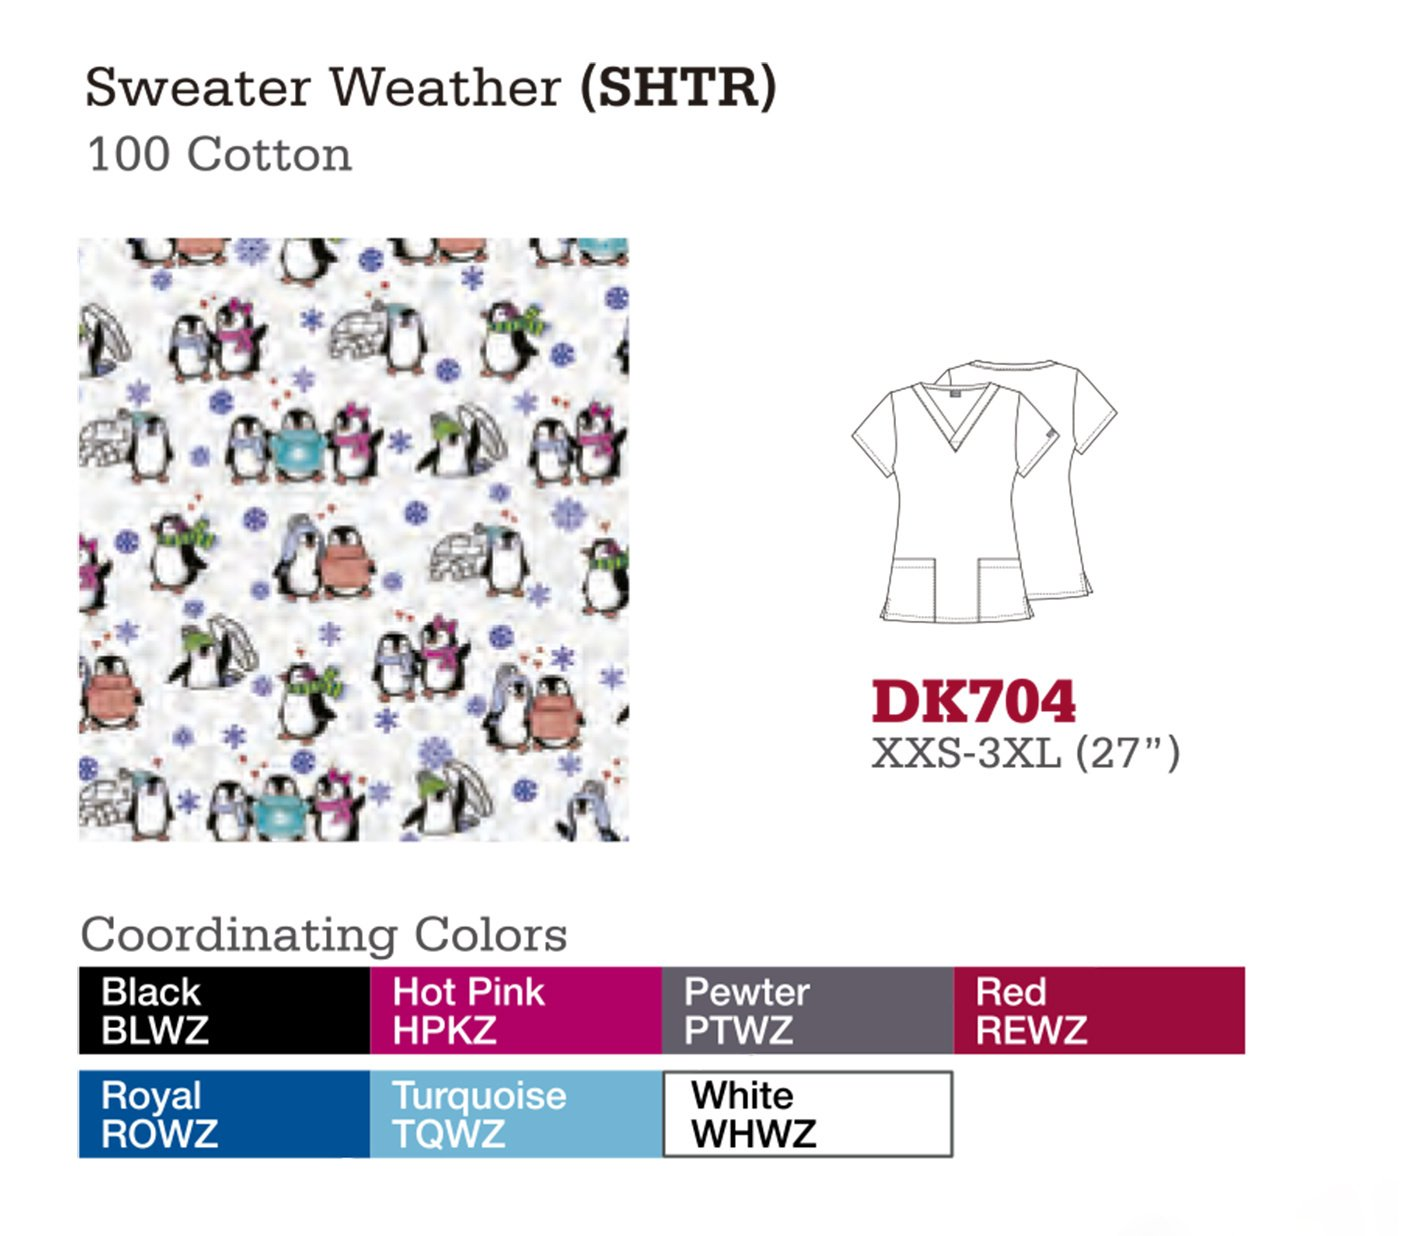 Sweater Wheather. DK704.